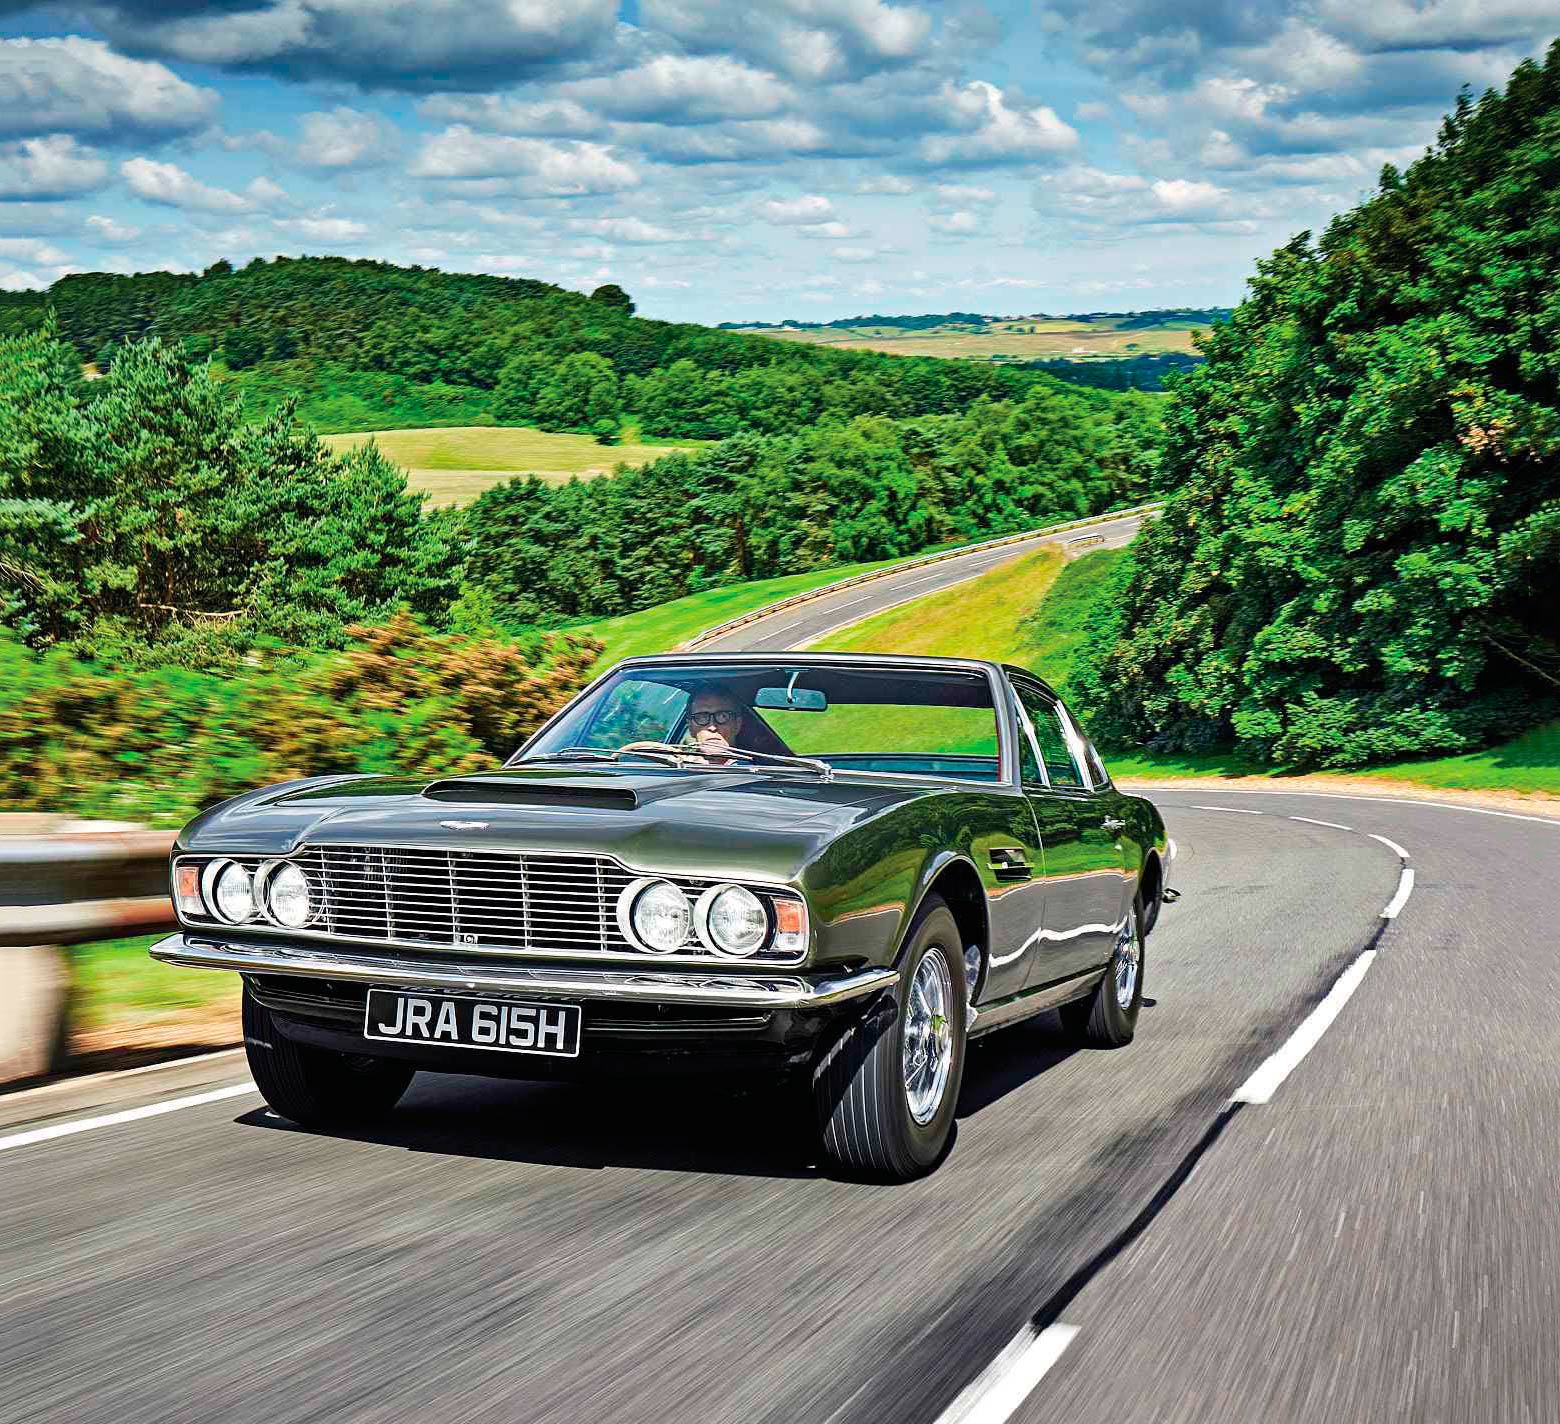 1970 Aston Martin DBS road test